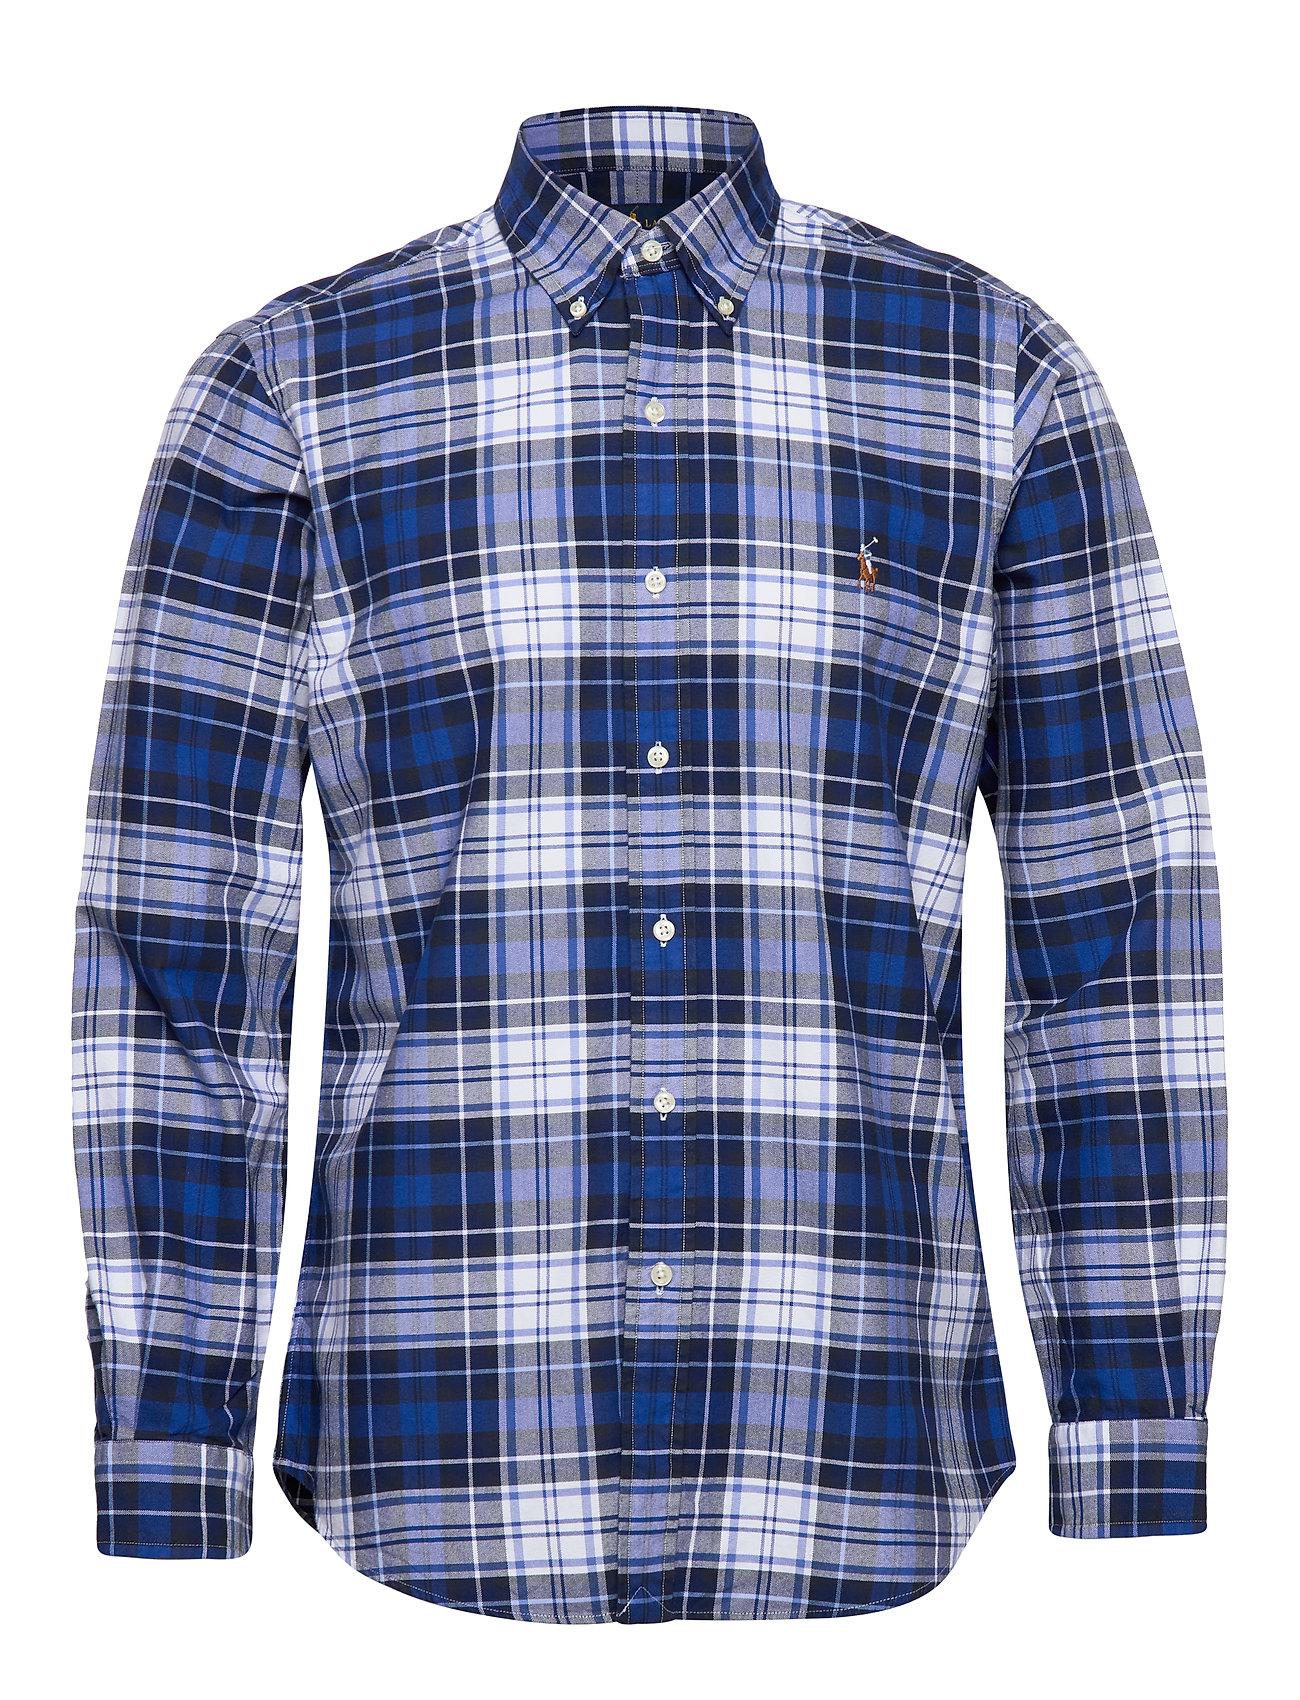 Polo Ralph Lauren Custom Fit Striped Shirt - 4336 BLUE/WHITE M